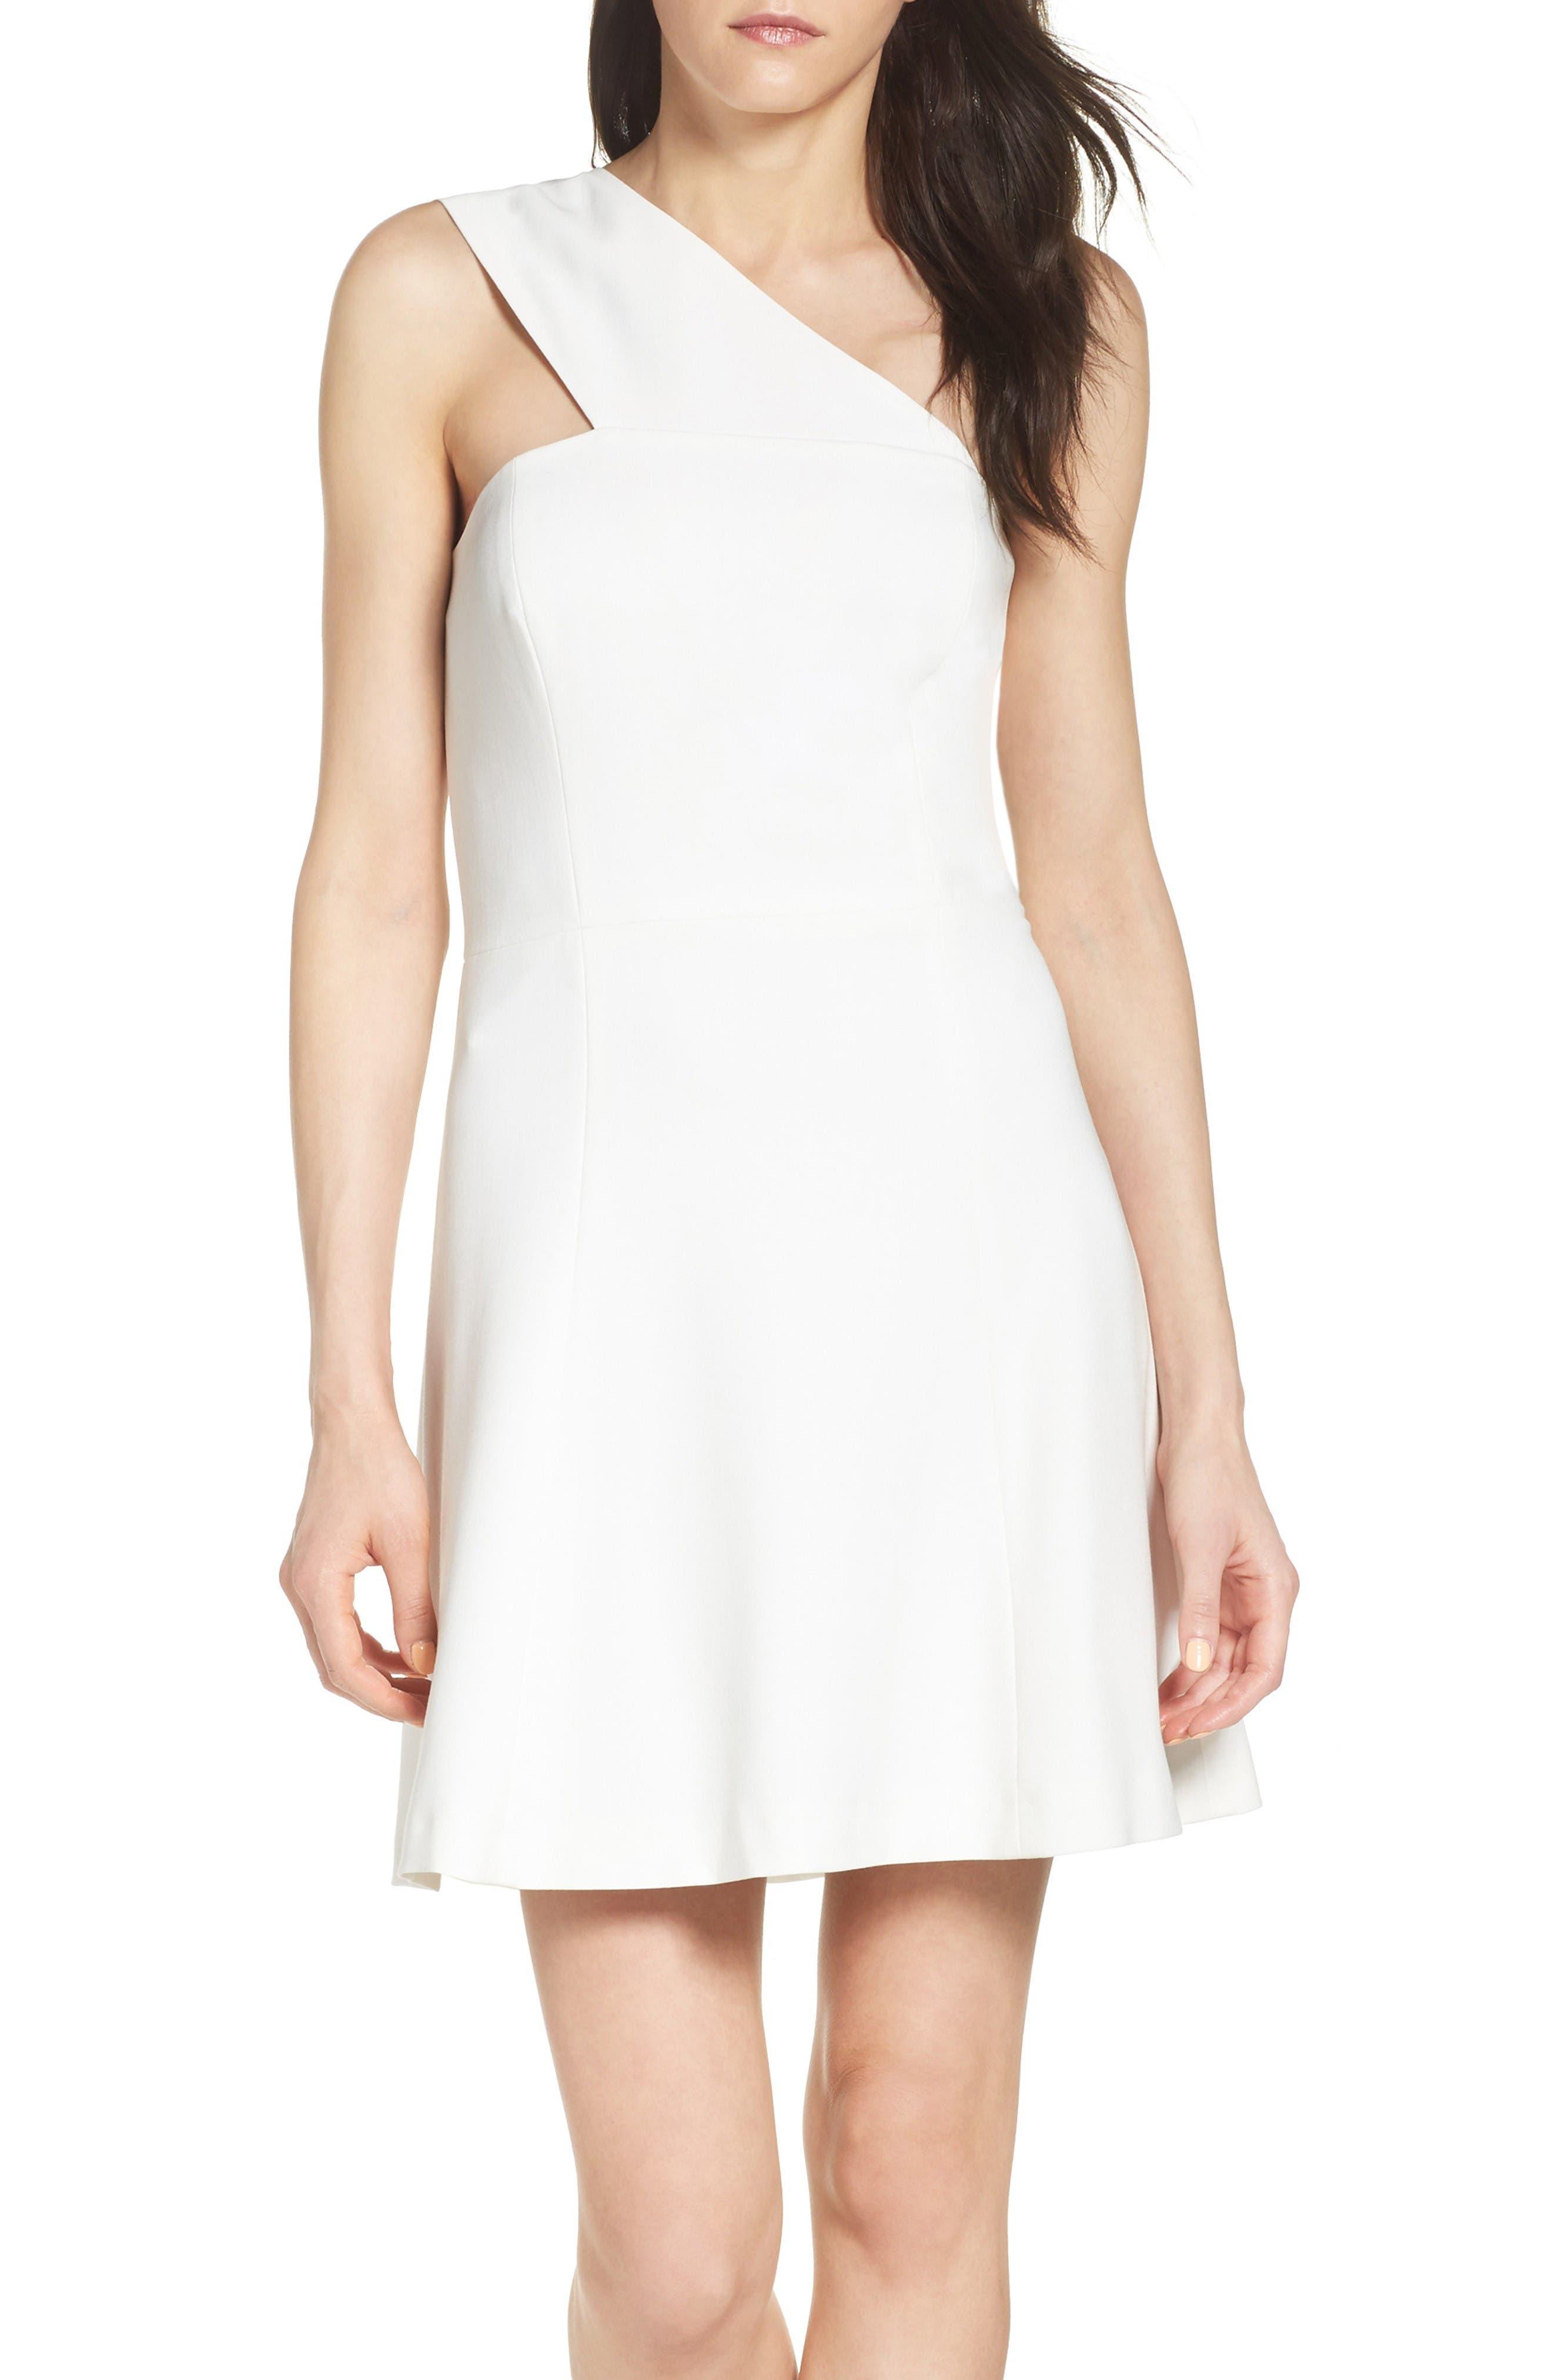 French Connection Whisper Light Dress